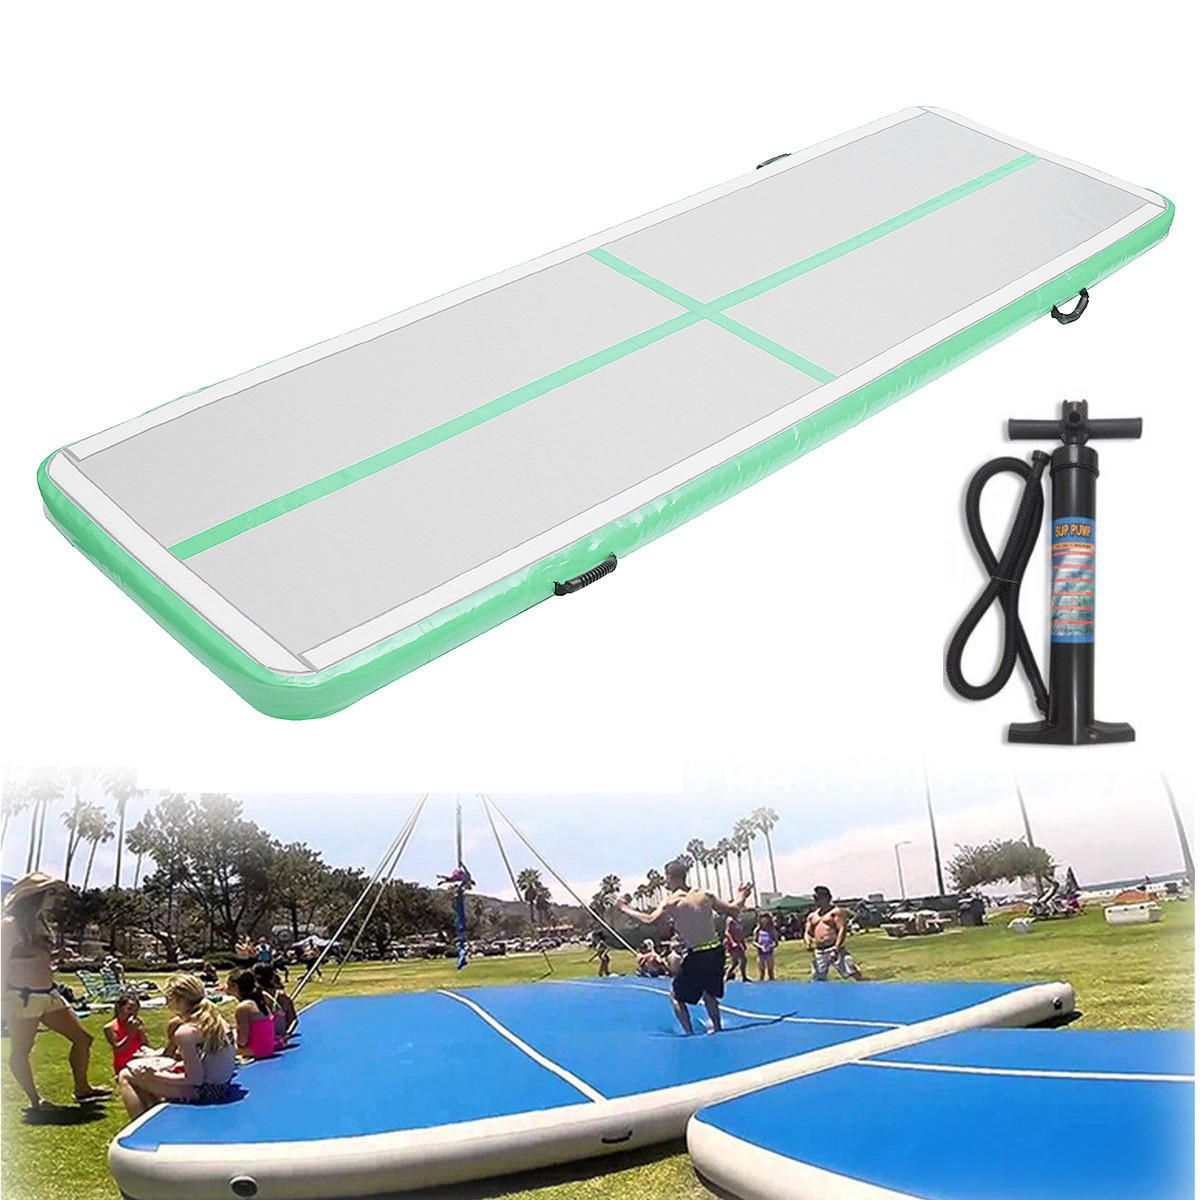 31+ Inflatable gymnastics air track ideas